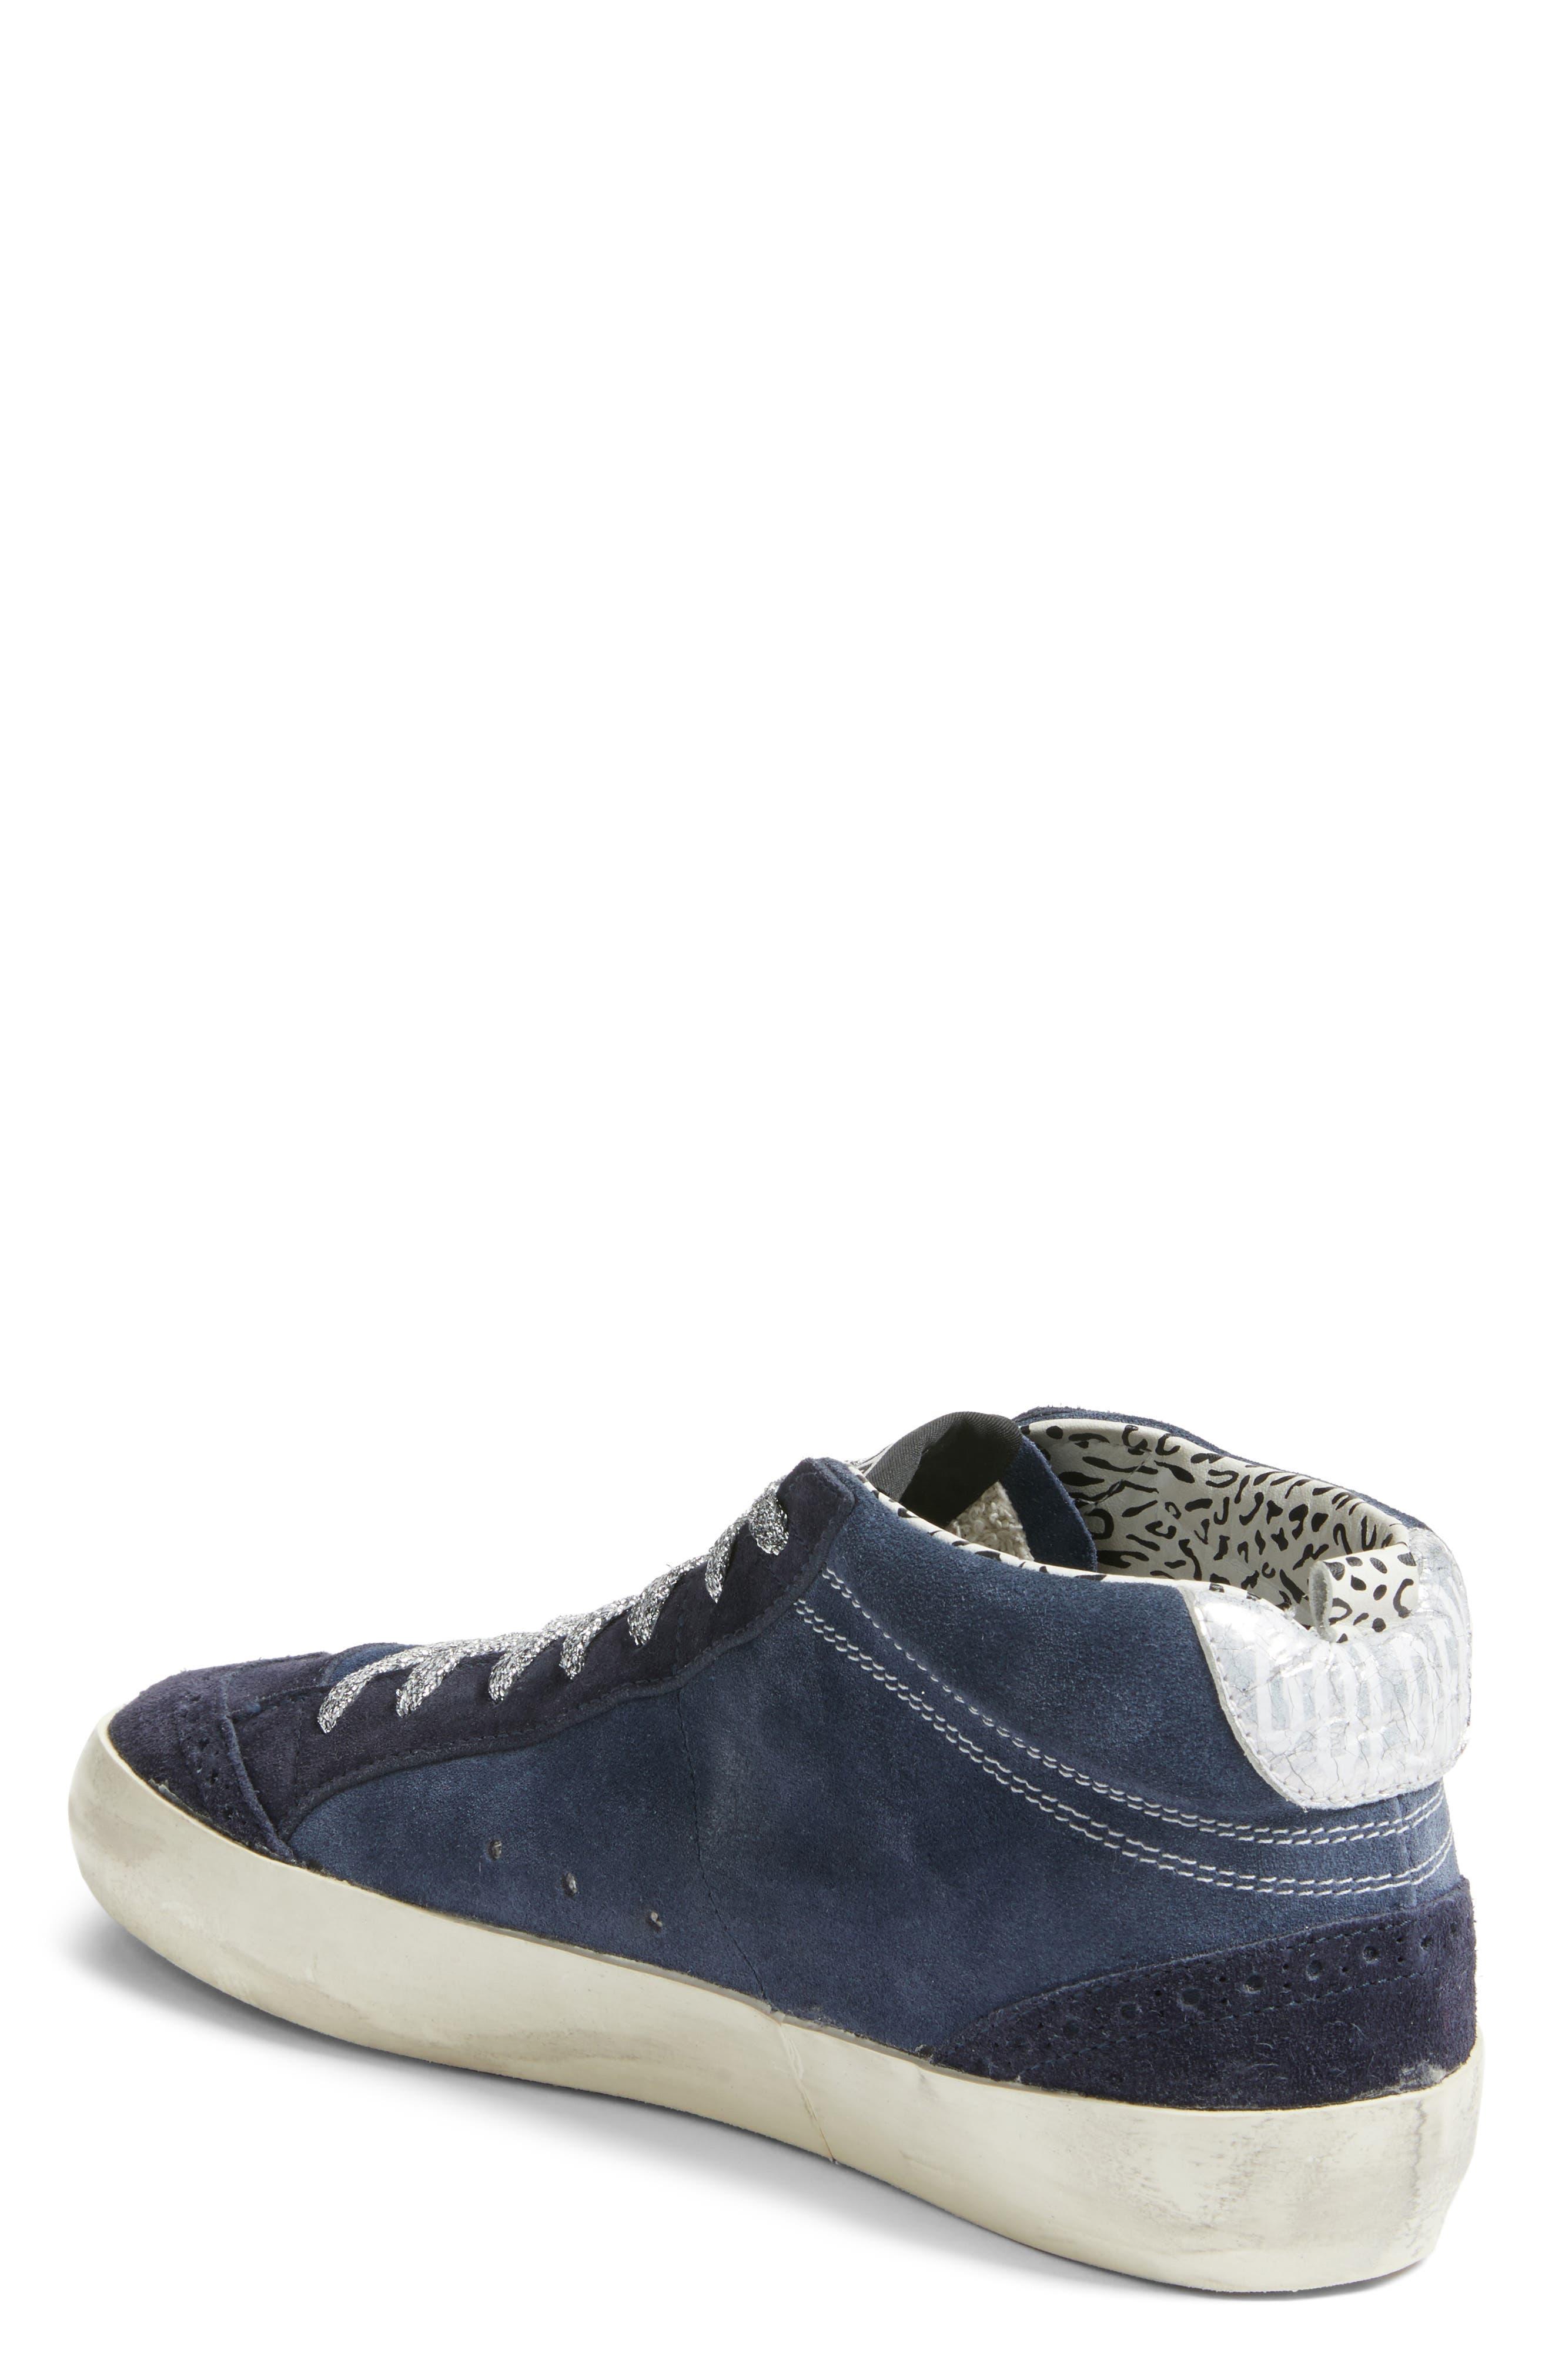 Star Mid Top Sneaker,                             Alternate thumbnail 2, color,                             401